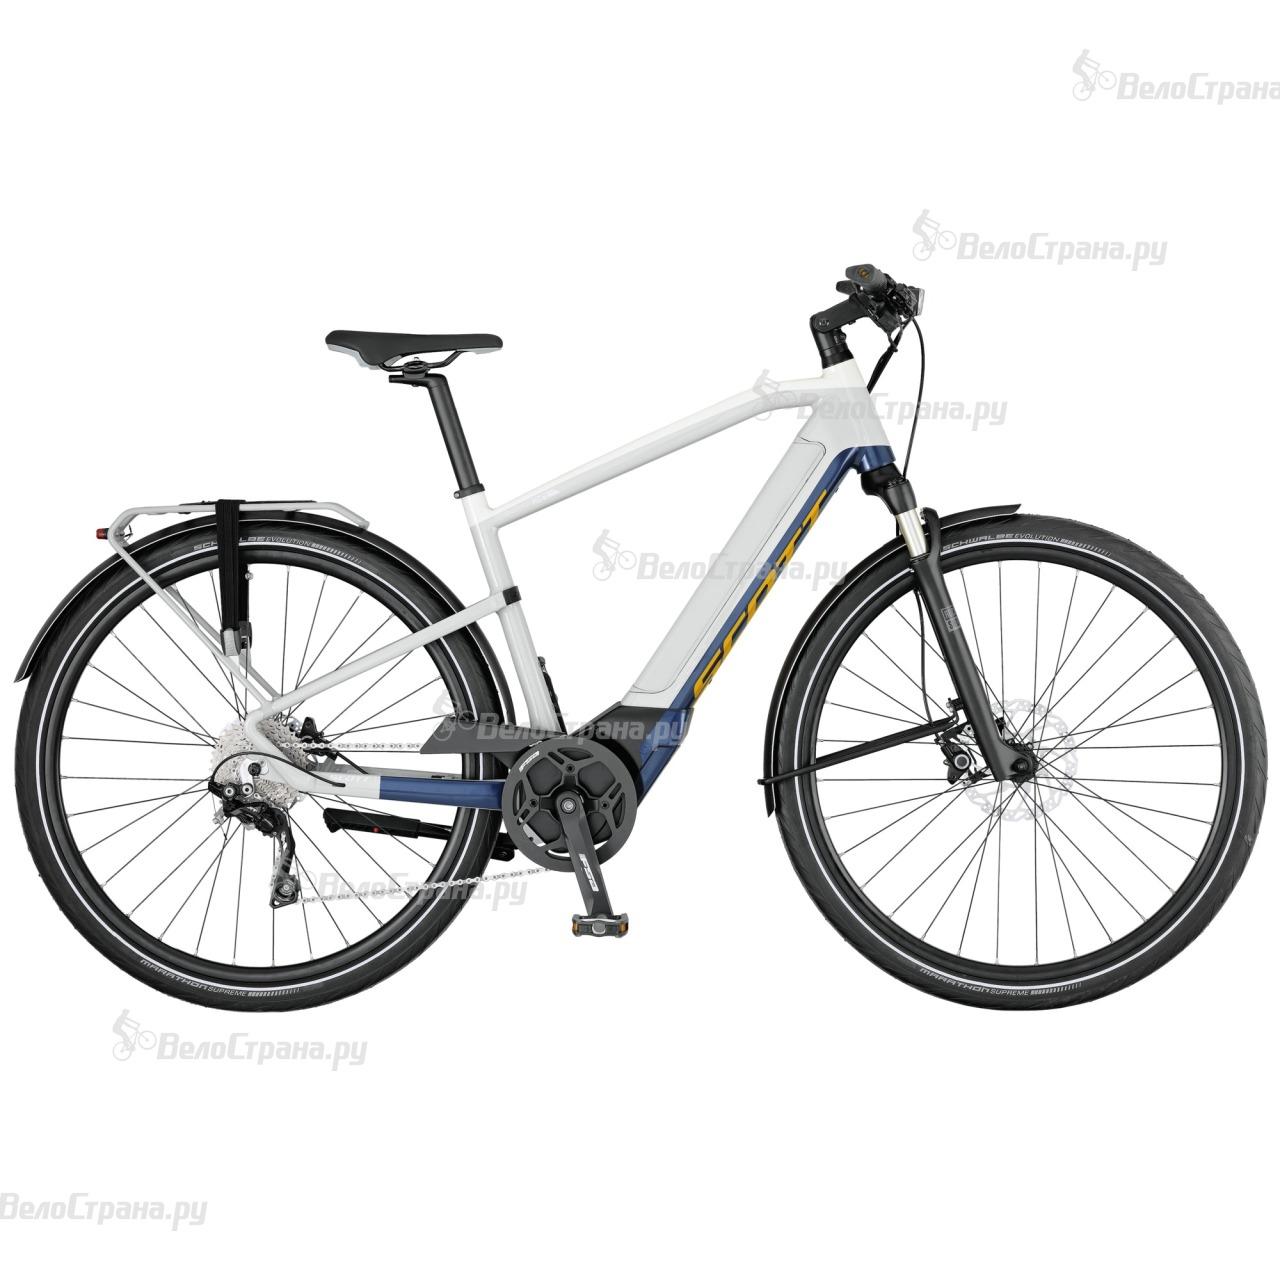 Велосипед Scott E-Silence 20 (2017) велосипед scott e silence speed 20 2017